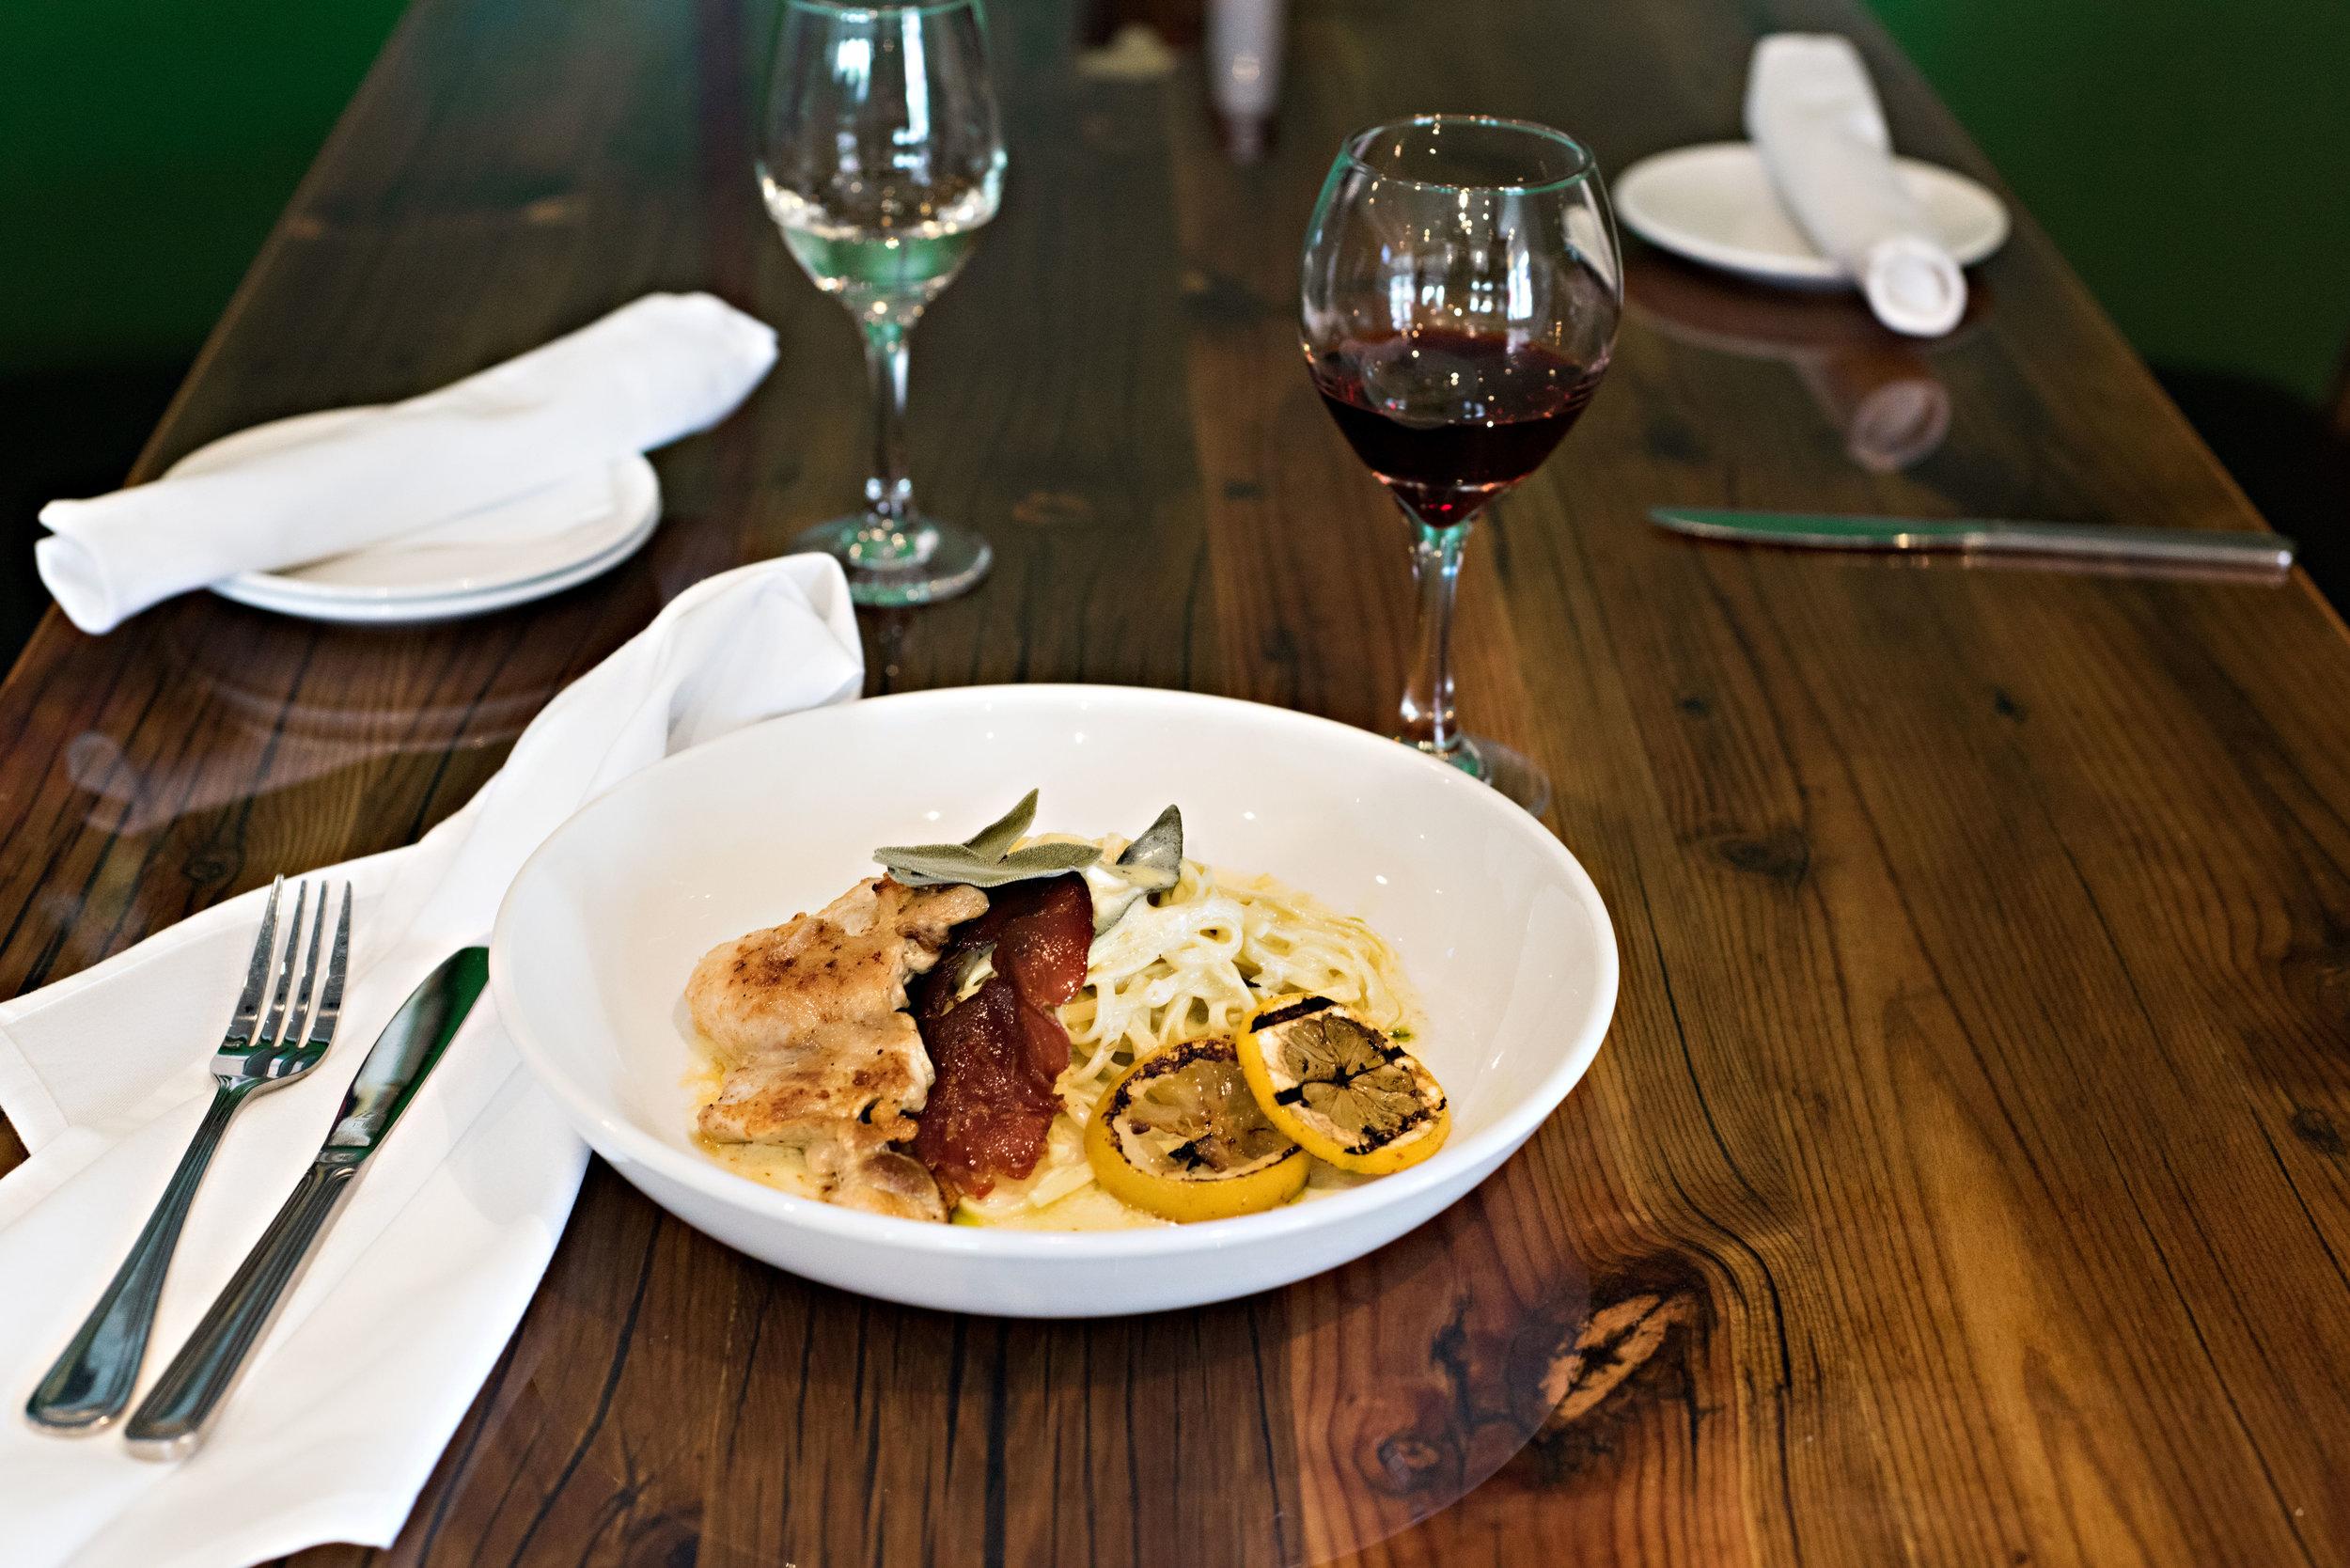 zeolis-restaurant-clawson-mi-karunaphoto-photo(59).jpg